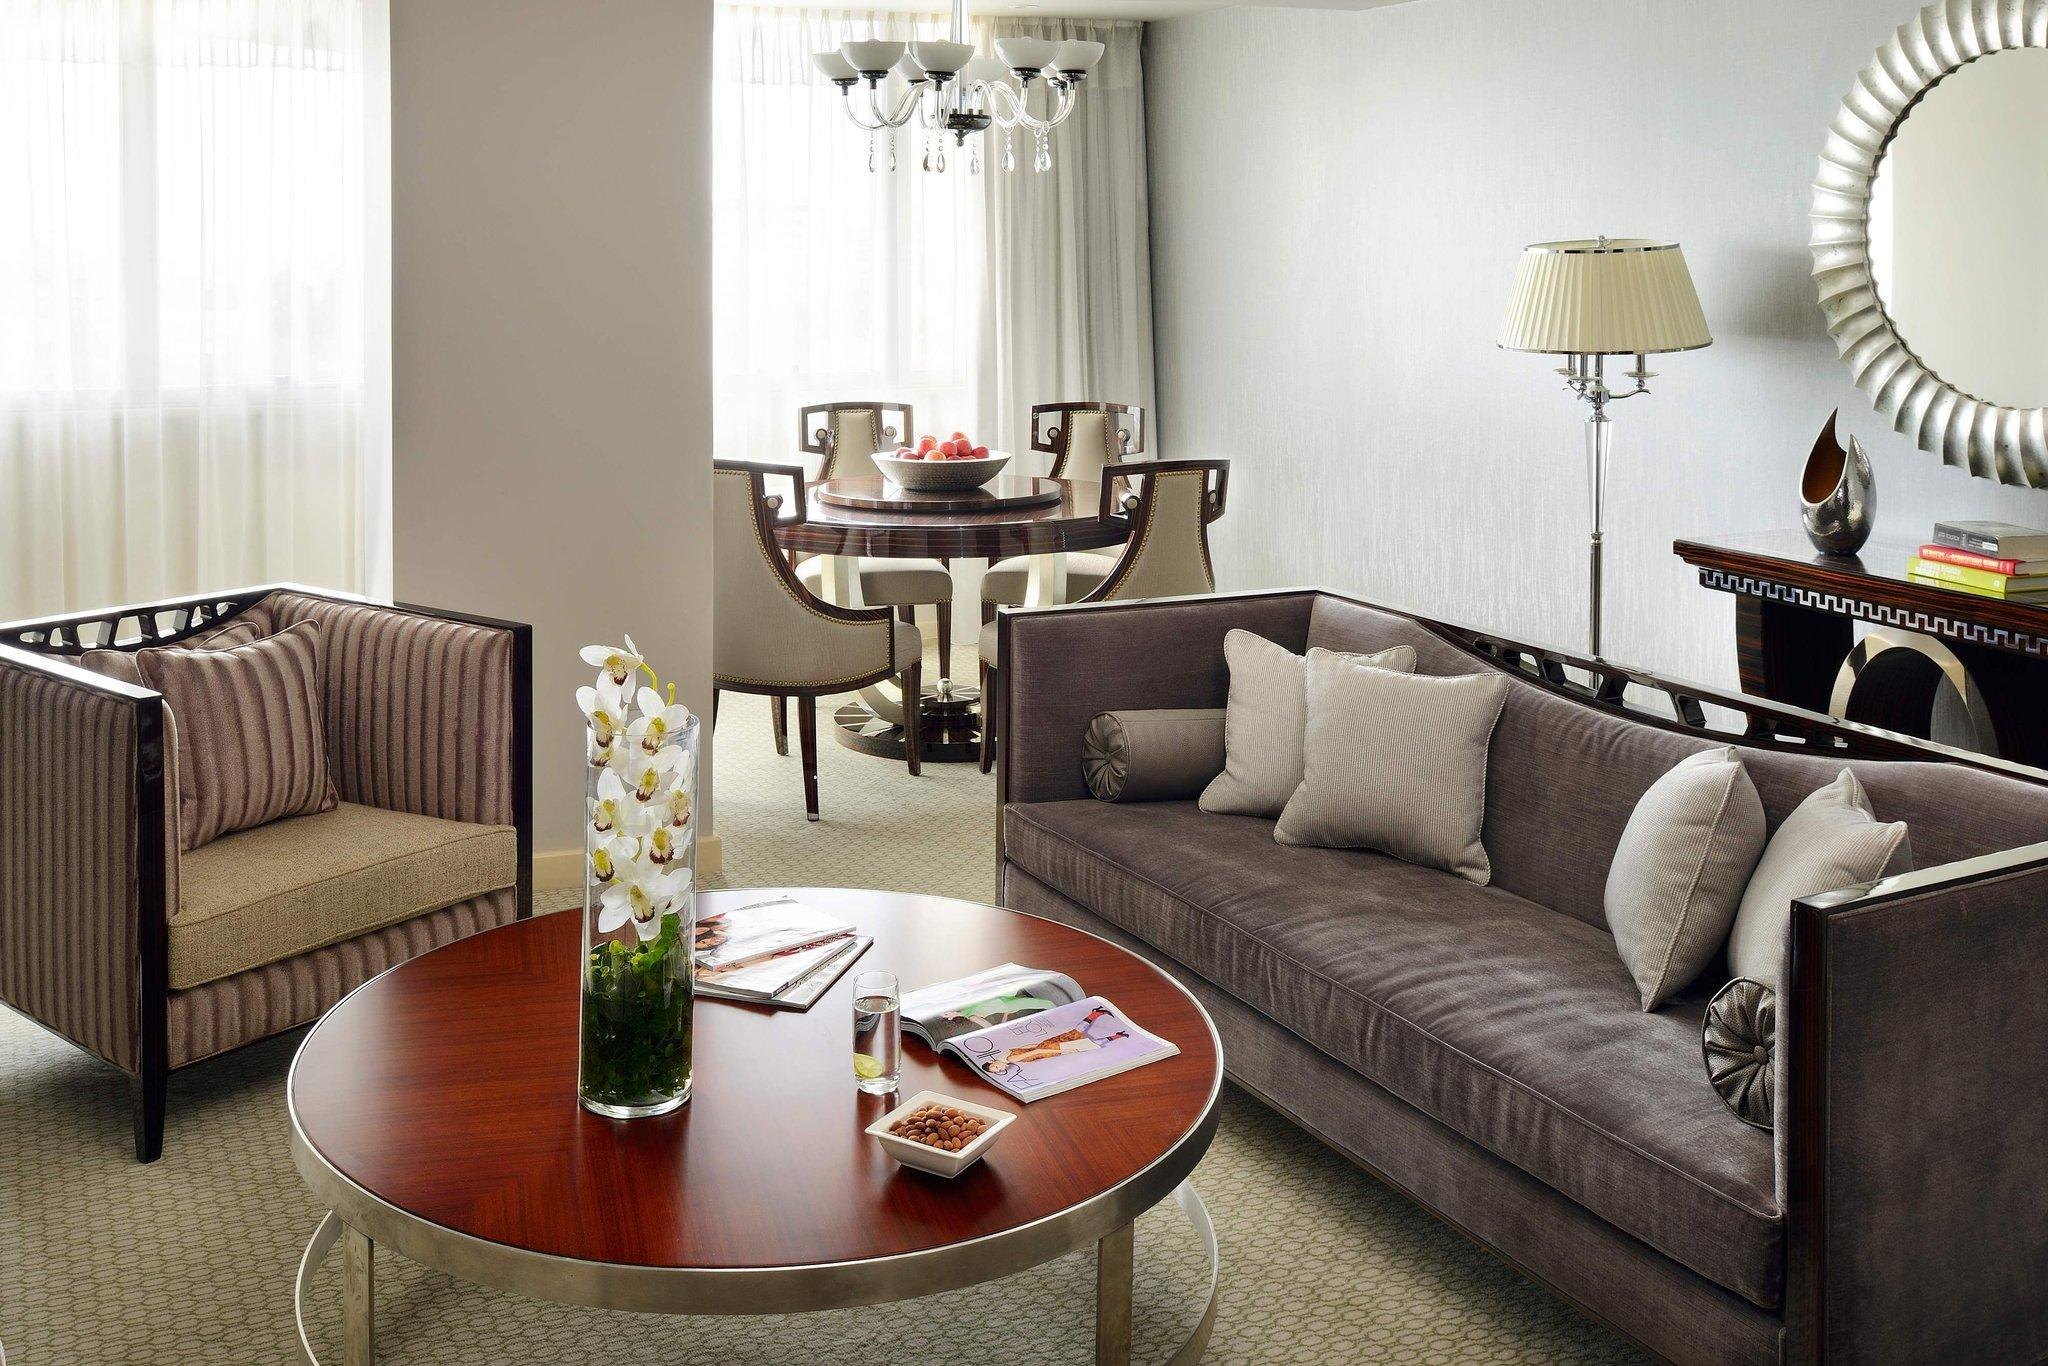 Marriott Executive Apartments Addis Ababa Ethiopia Photos Room